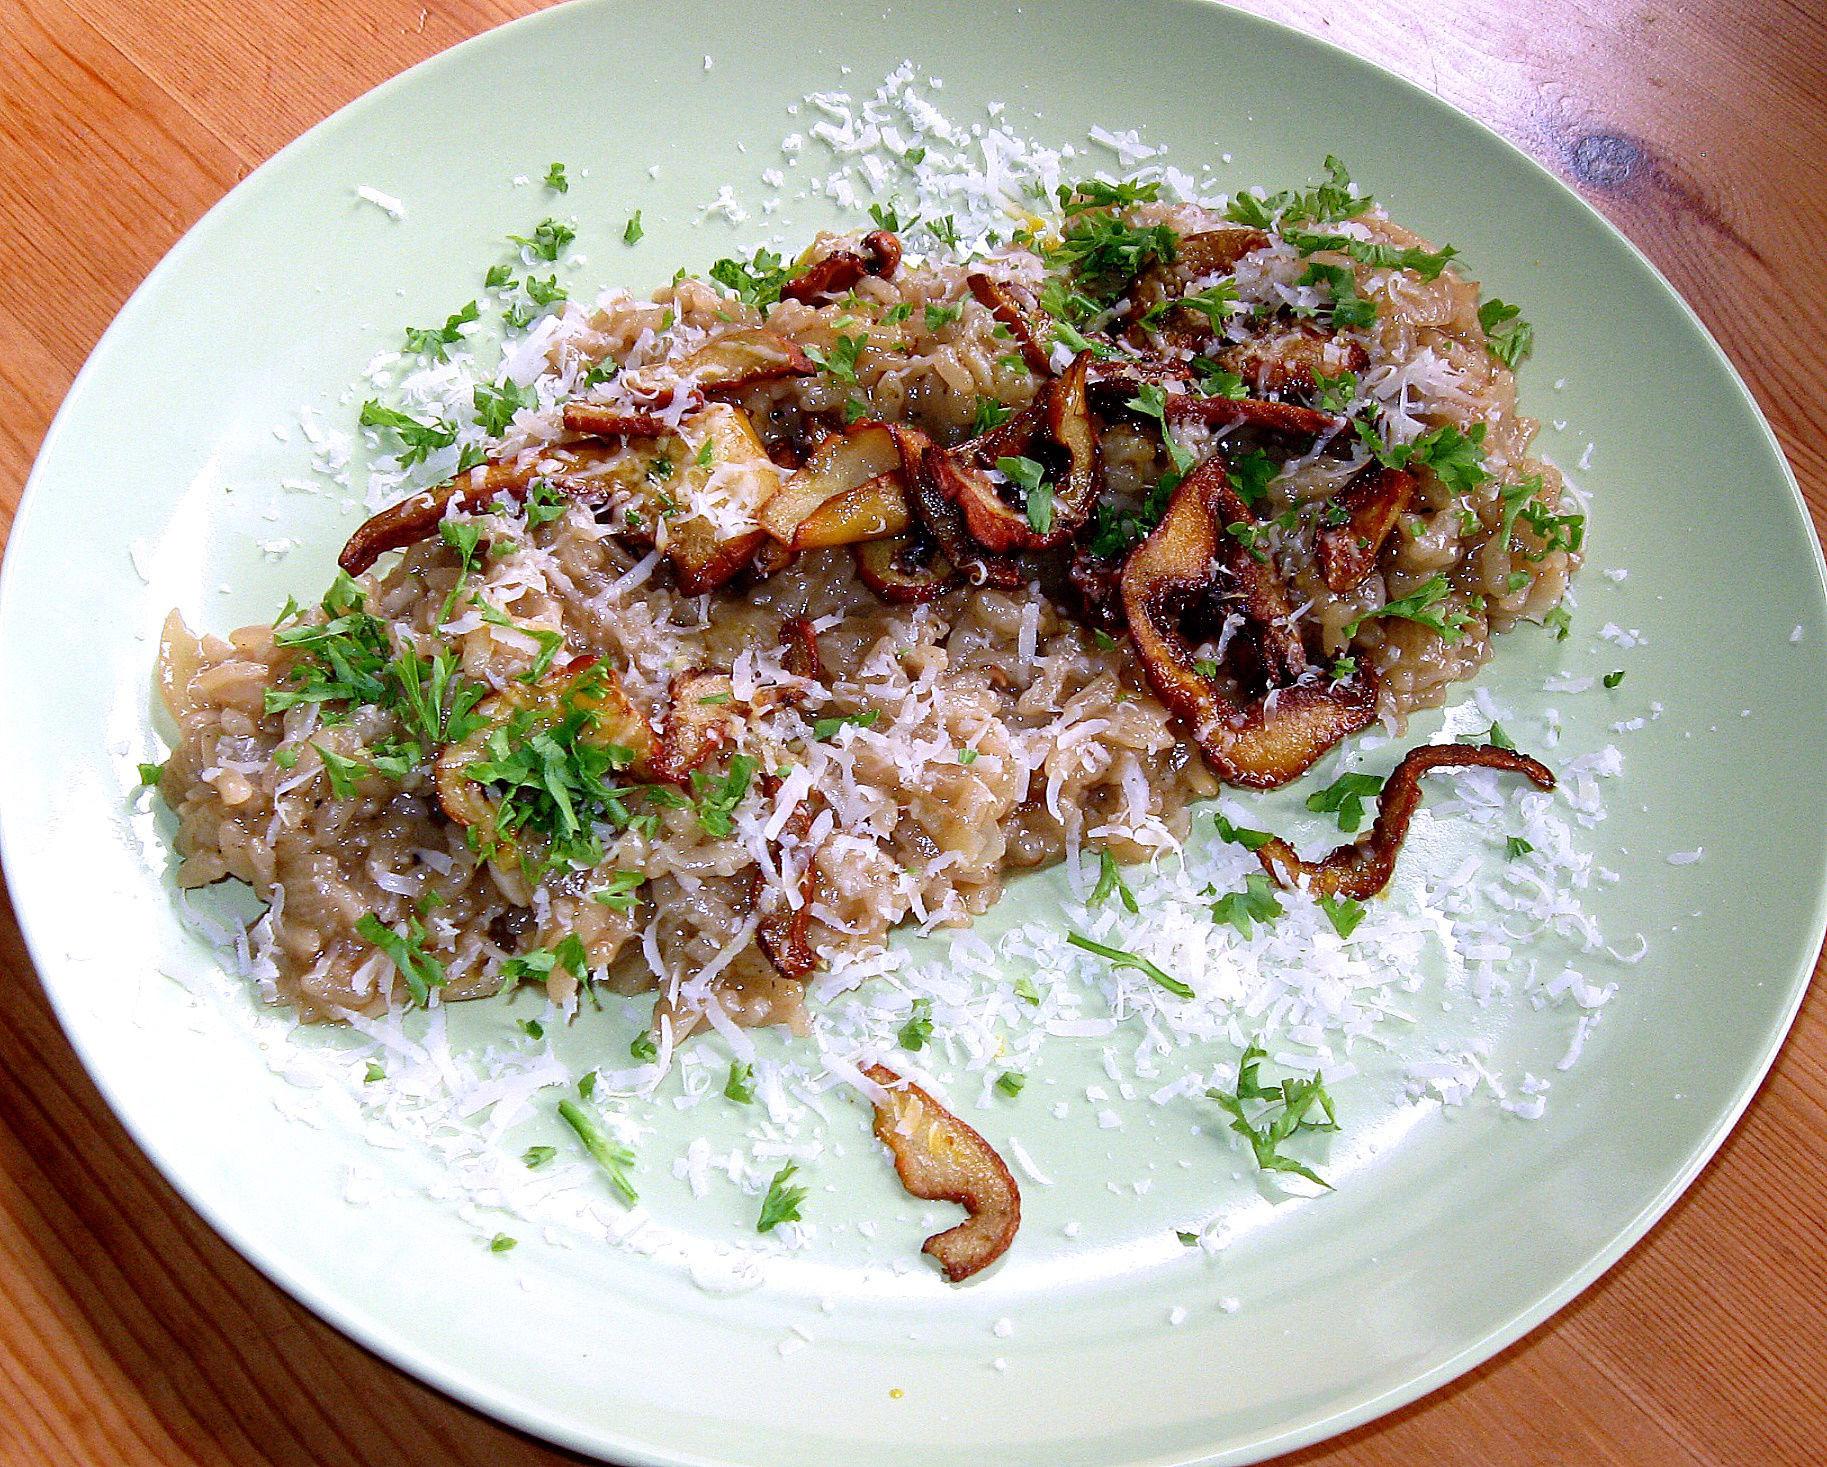 Gourmet Mushroom Risotto  Gourmet Mushroom Risotto recipe – All recipes Australia NZ